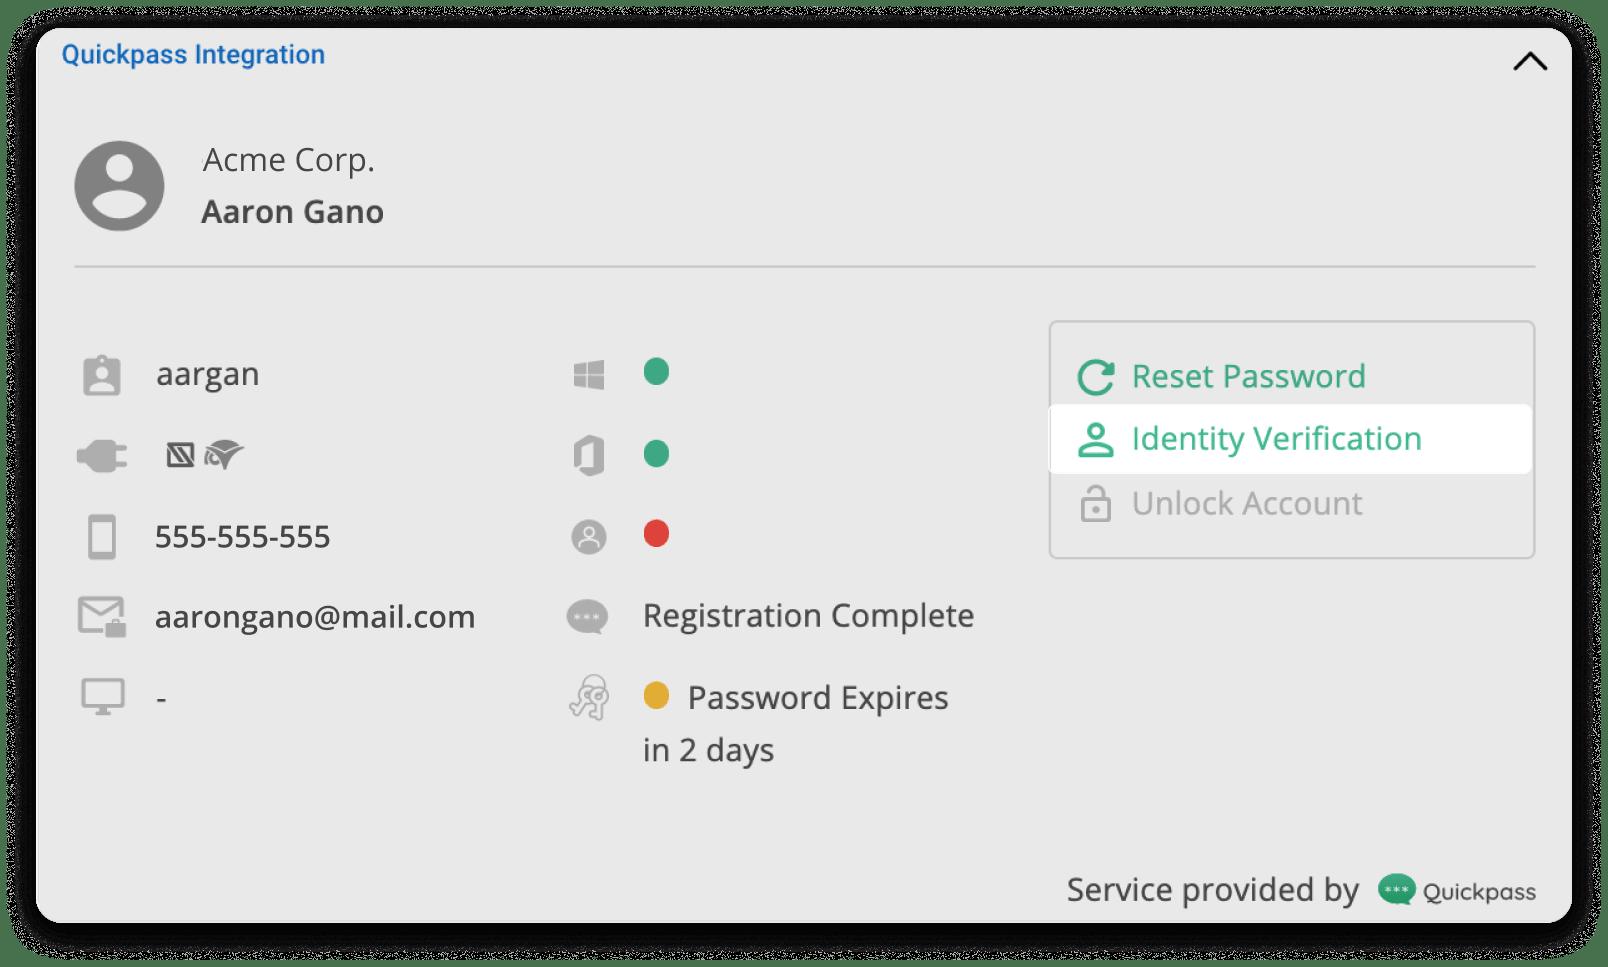 Identity verification Option Highlighted on Quickpass pod